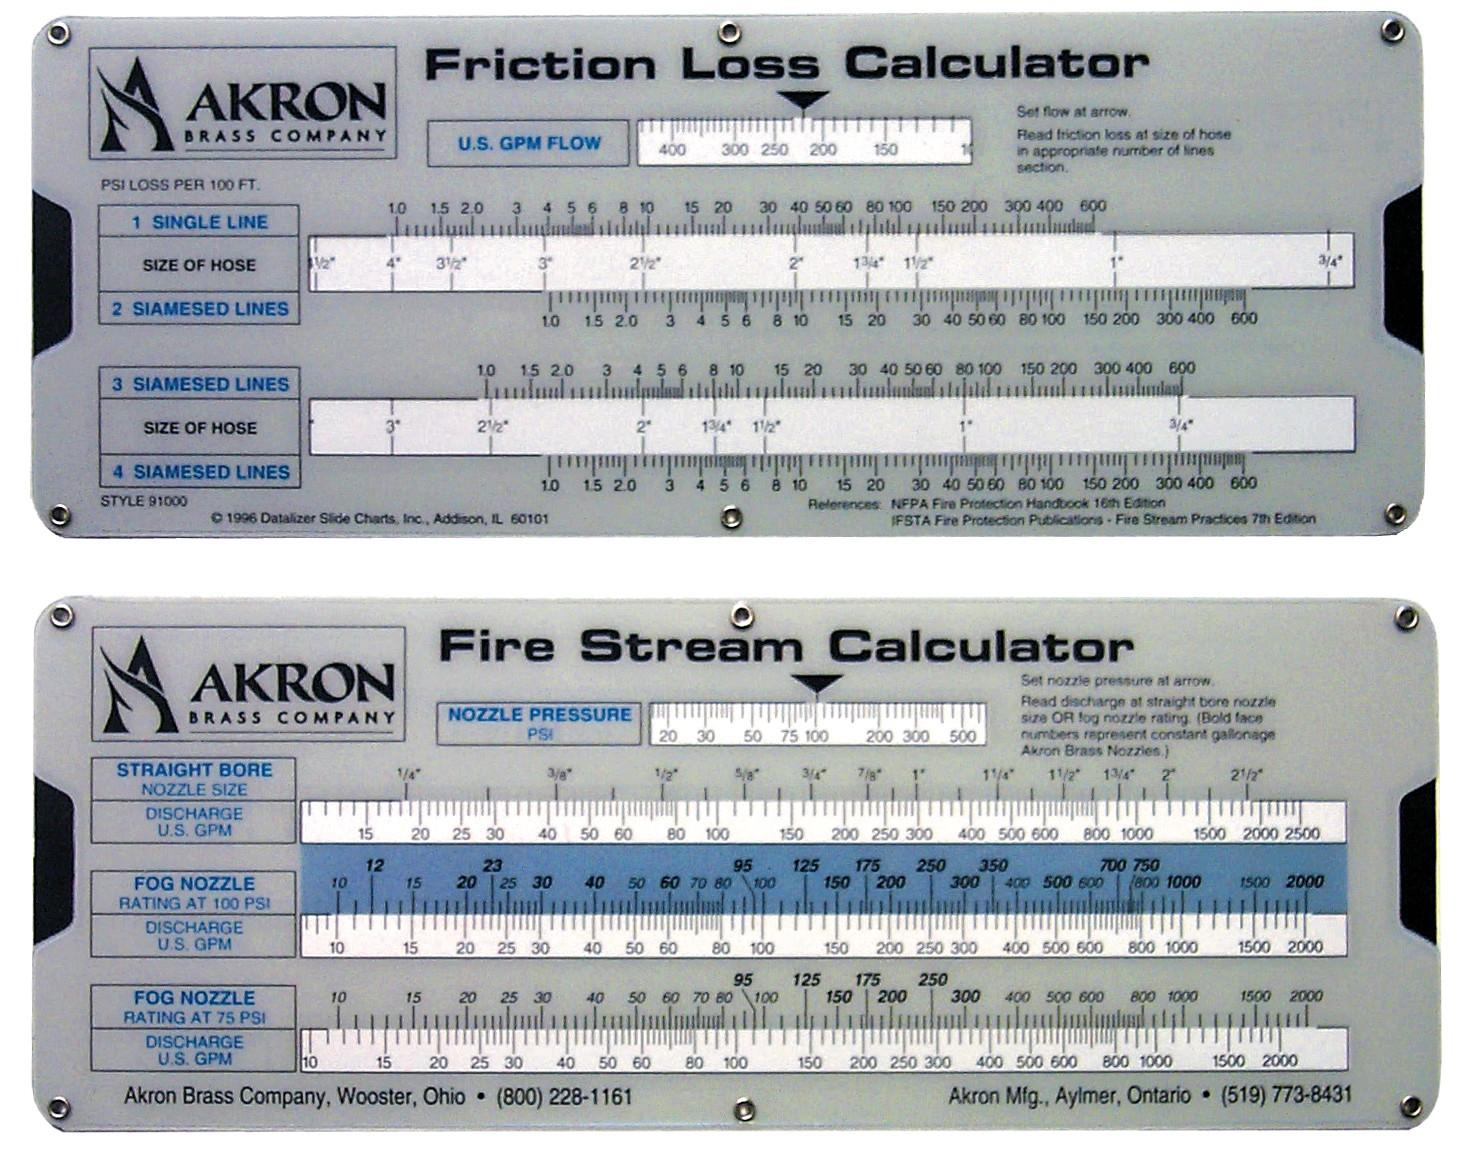 Fire Stream/Friction Loss Calculator